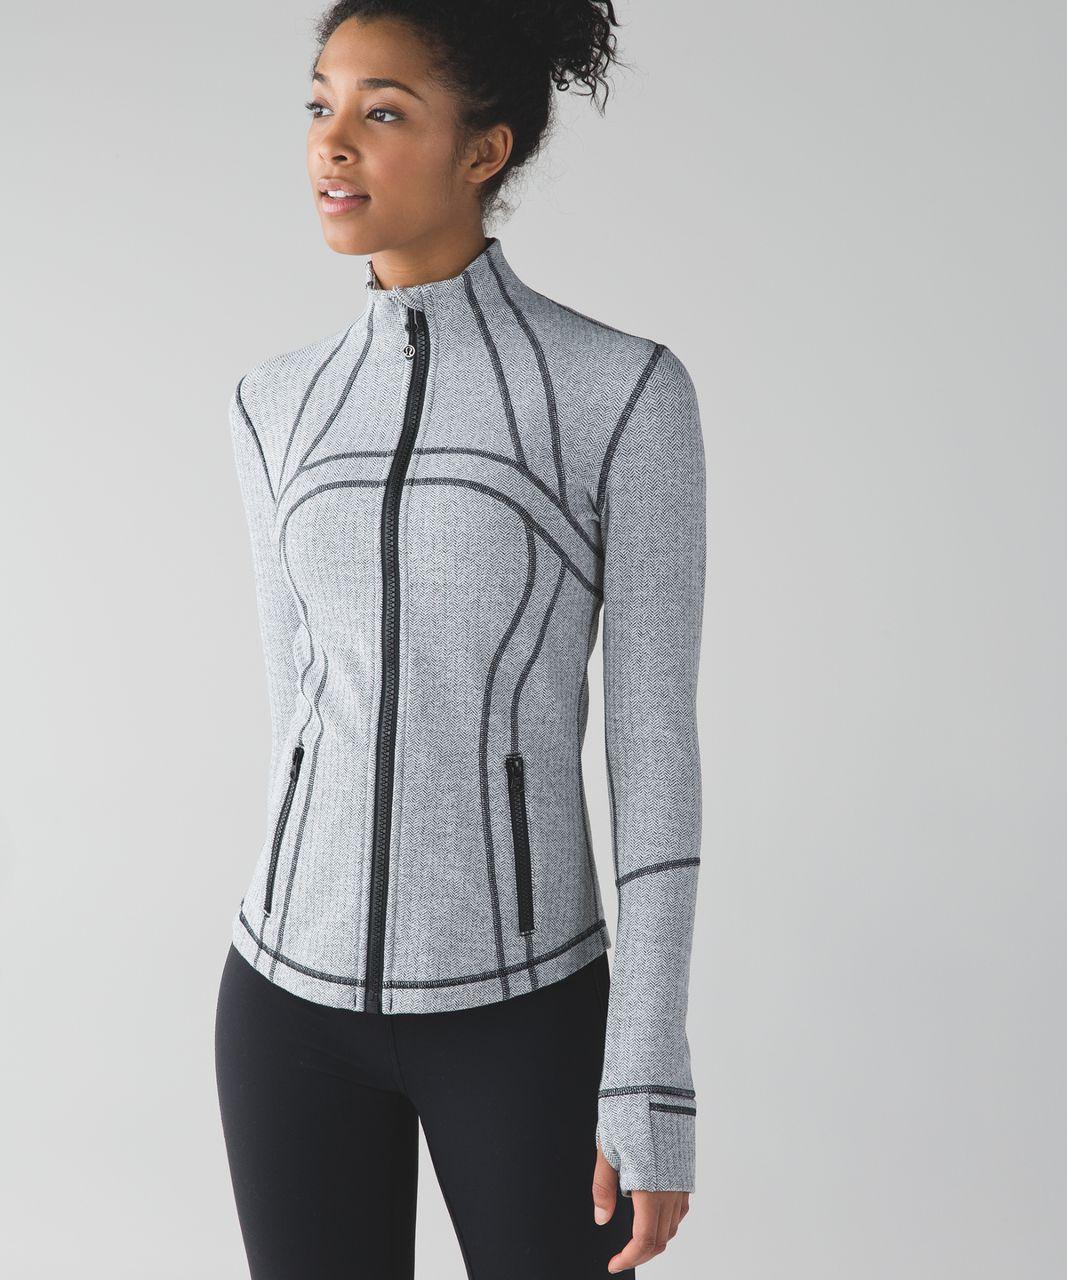 Lululemon Define Jacket - Heathered Herringbone Heathered Black White